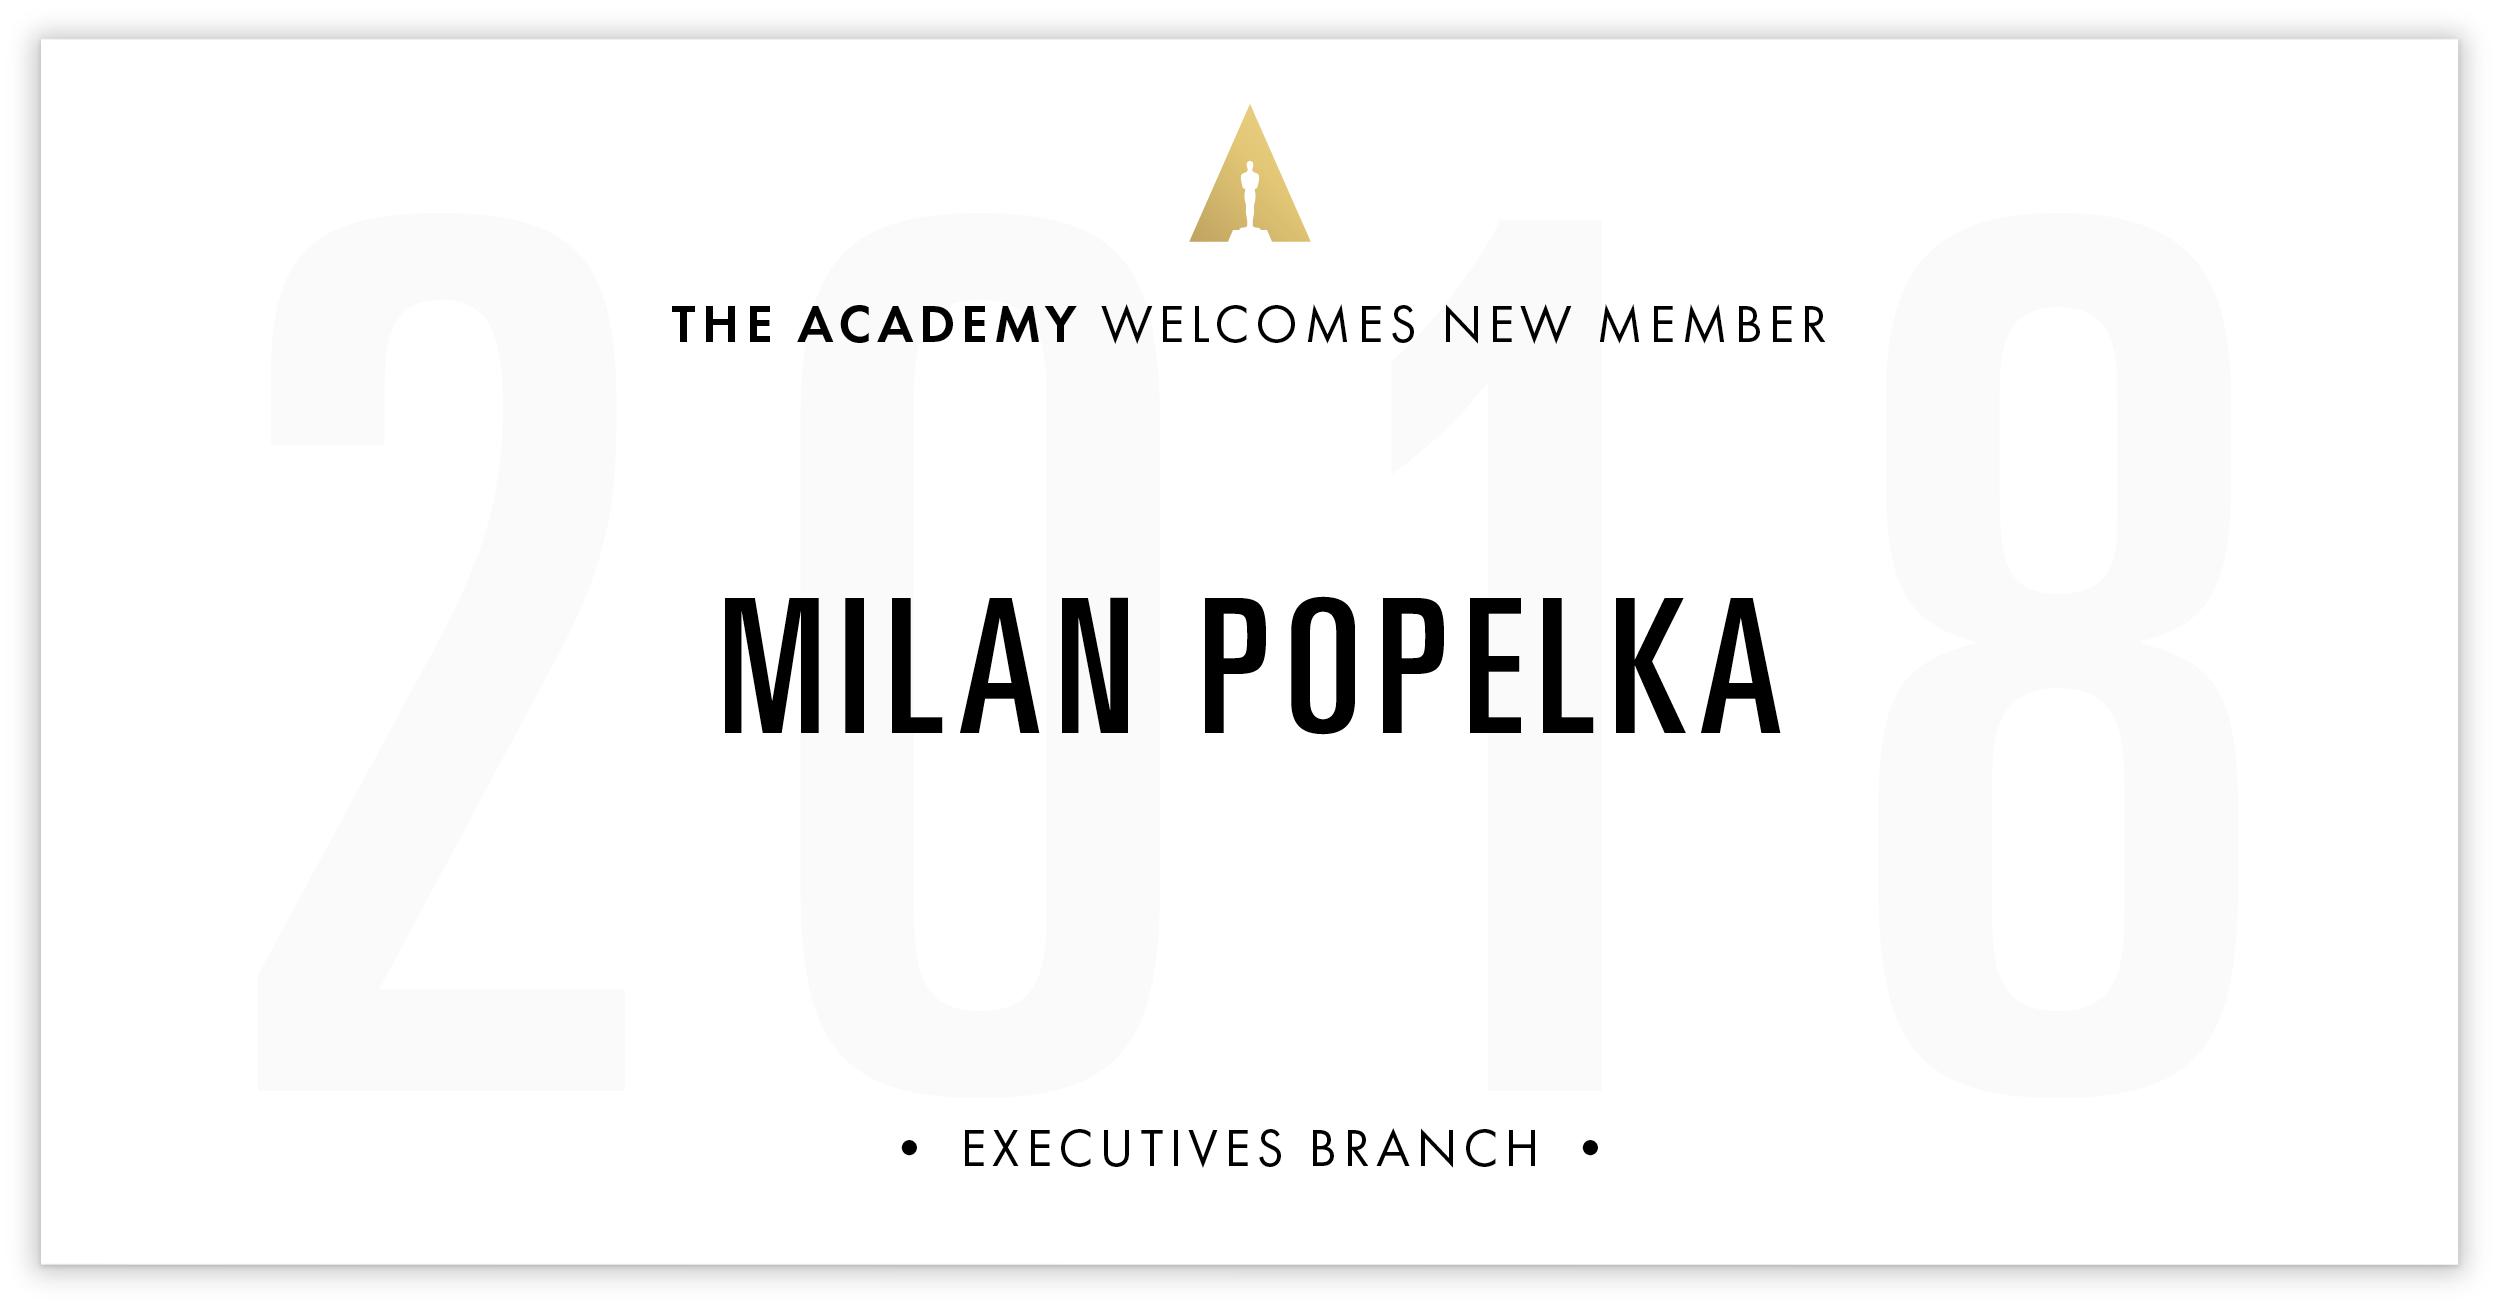 Milan Popelka is invited!